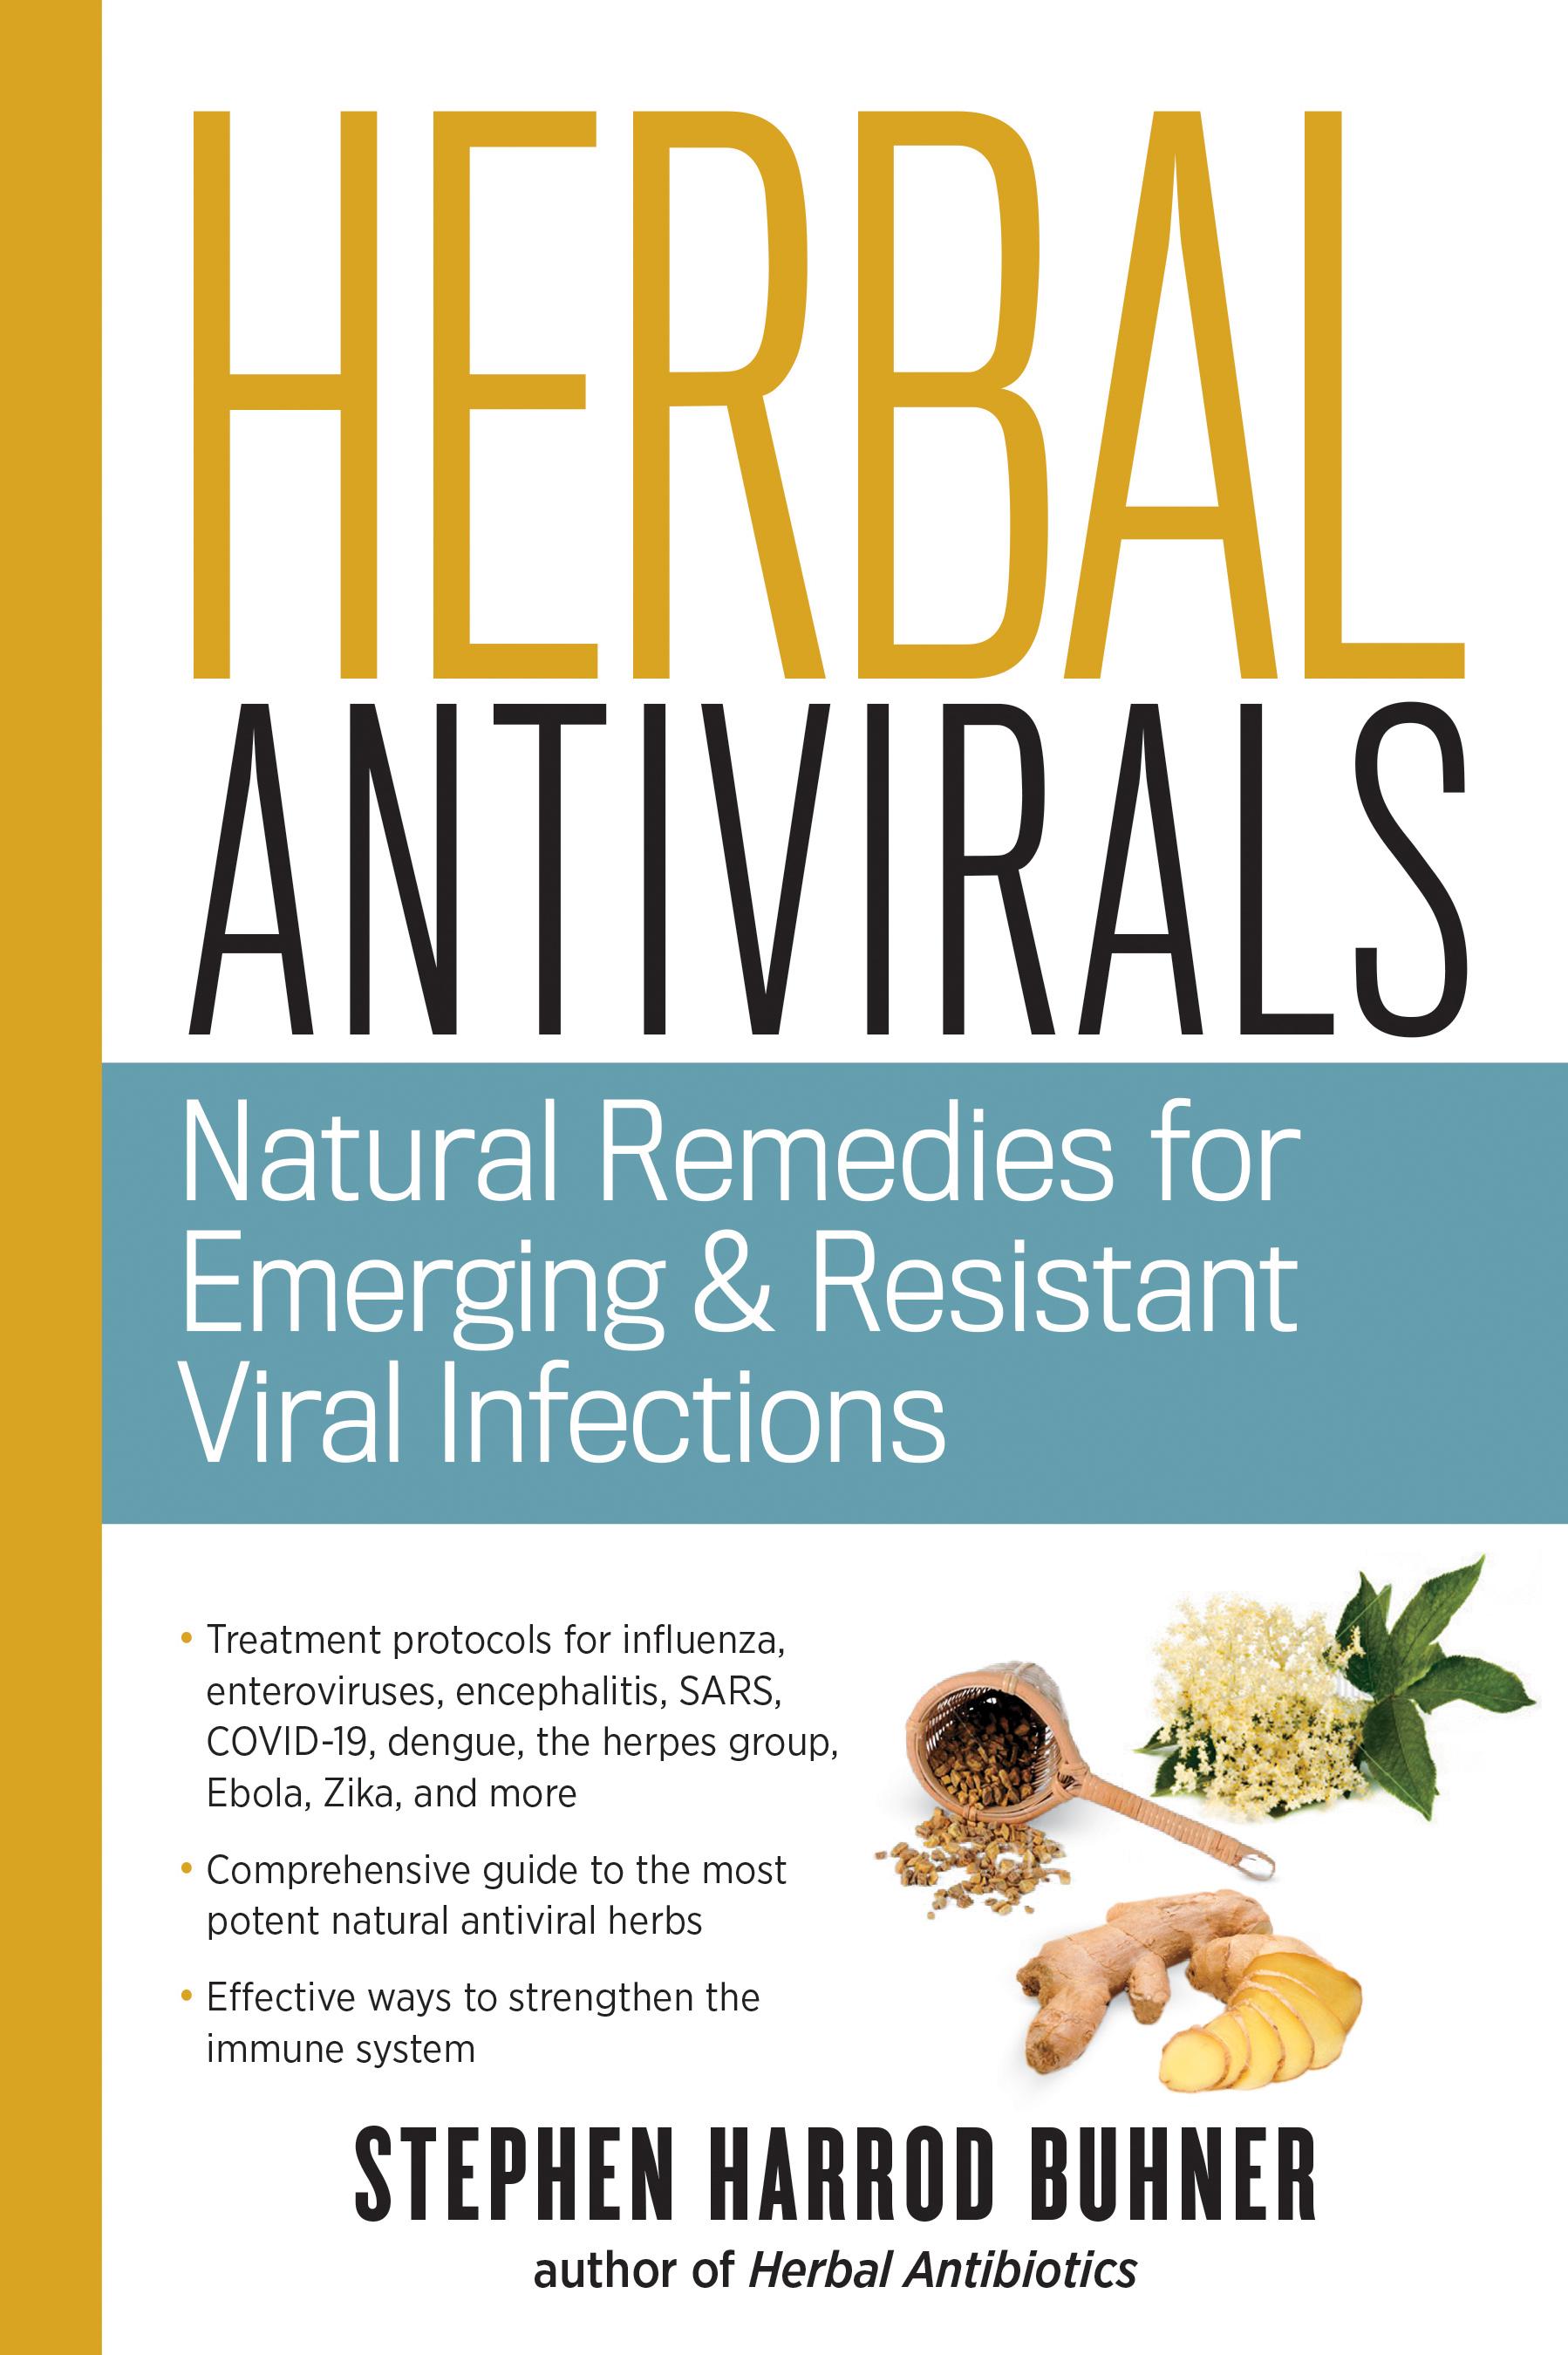 Herbal Antivirals Natural Remedies for Emerging & Resistant Viral Infections - Stephen Harrod Buhner